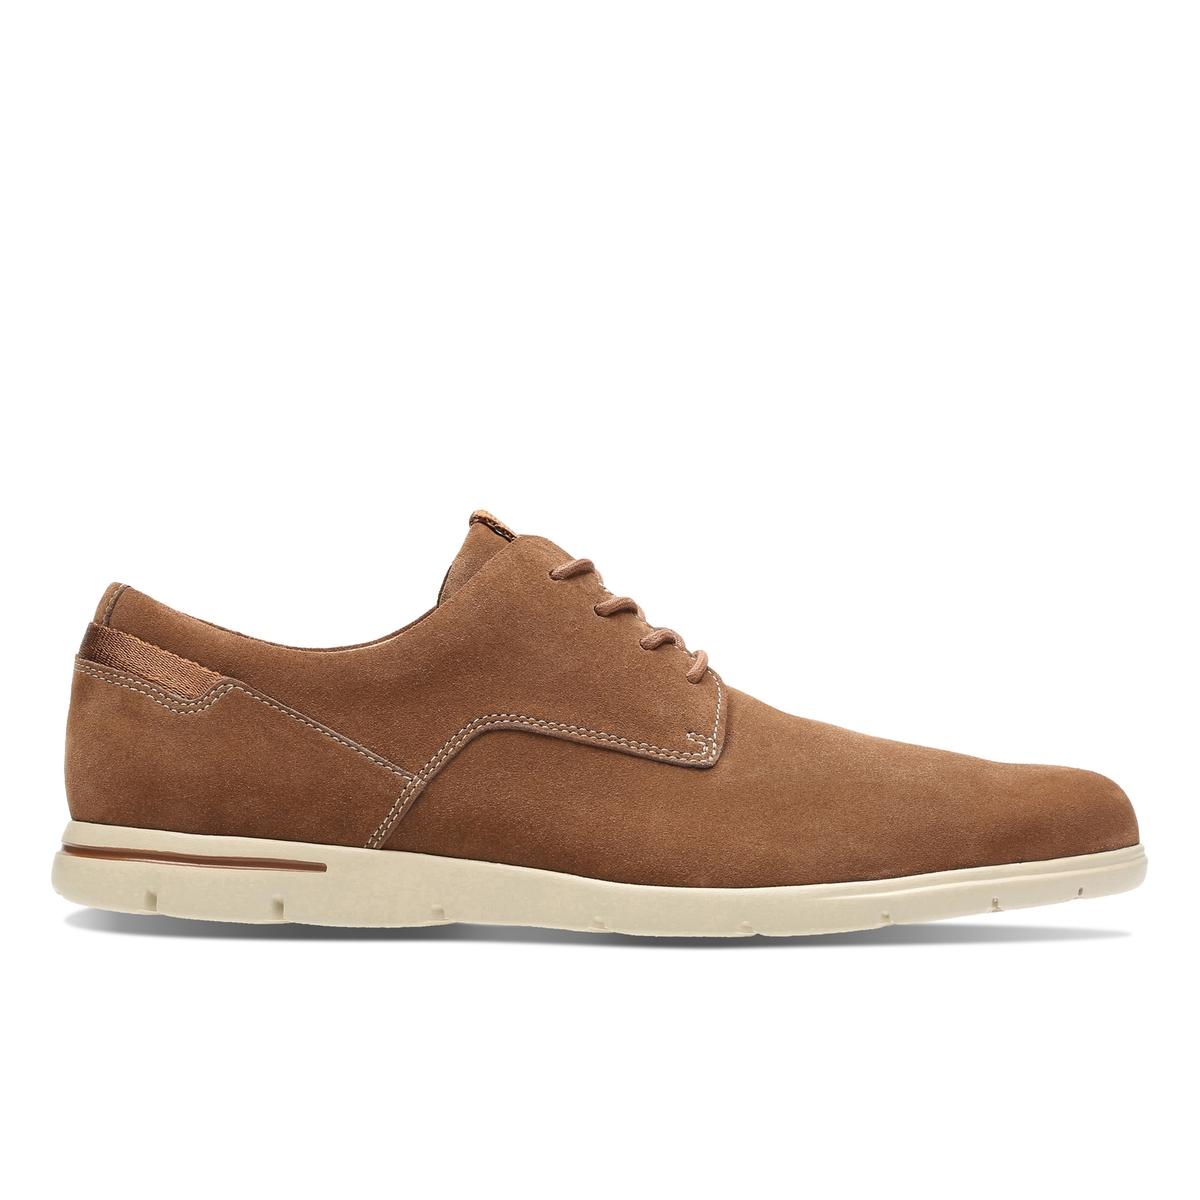 Ботинки-дерби из замши Vennor Walk туфли clarks 2015 clovelly walk